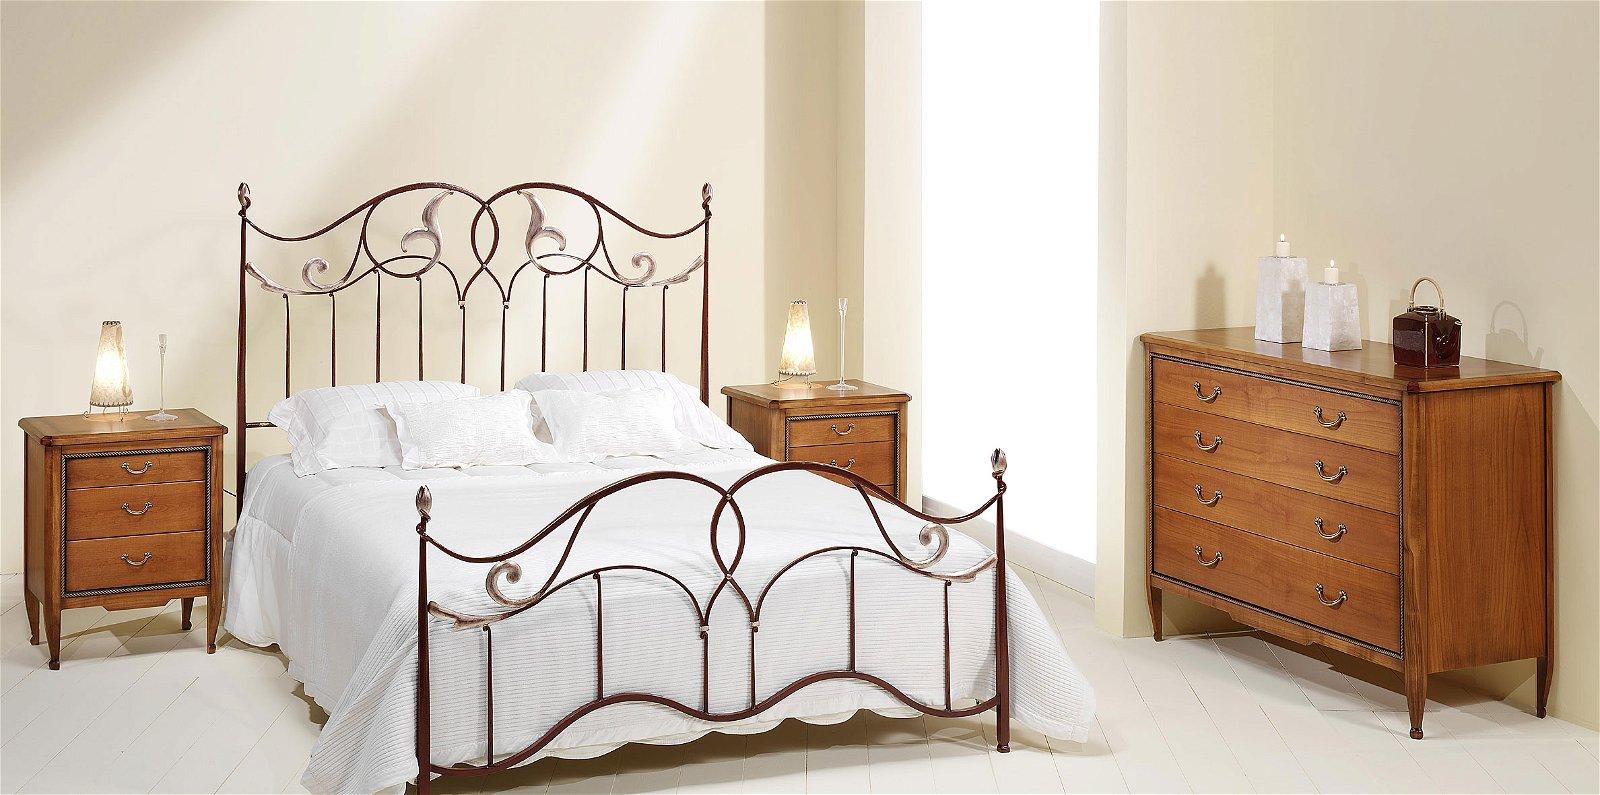 Dormitorio forja Caroli